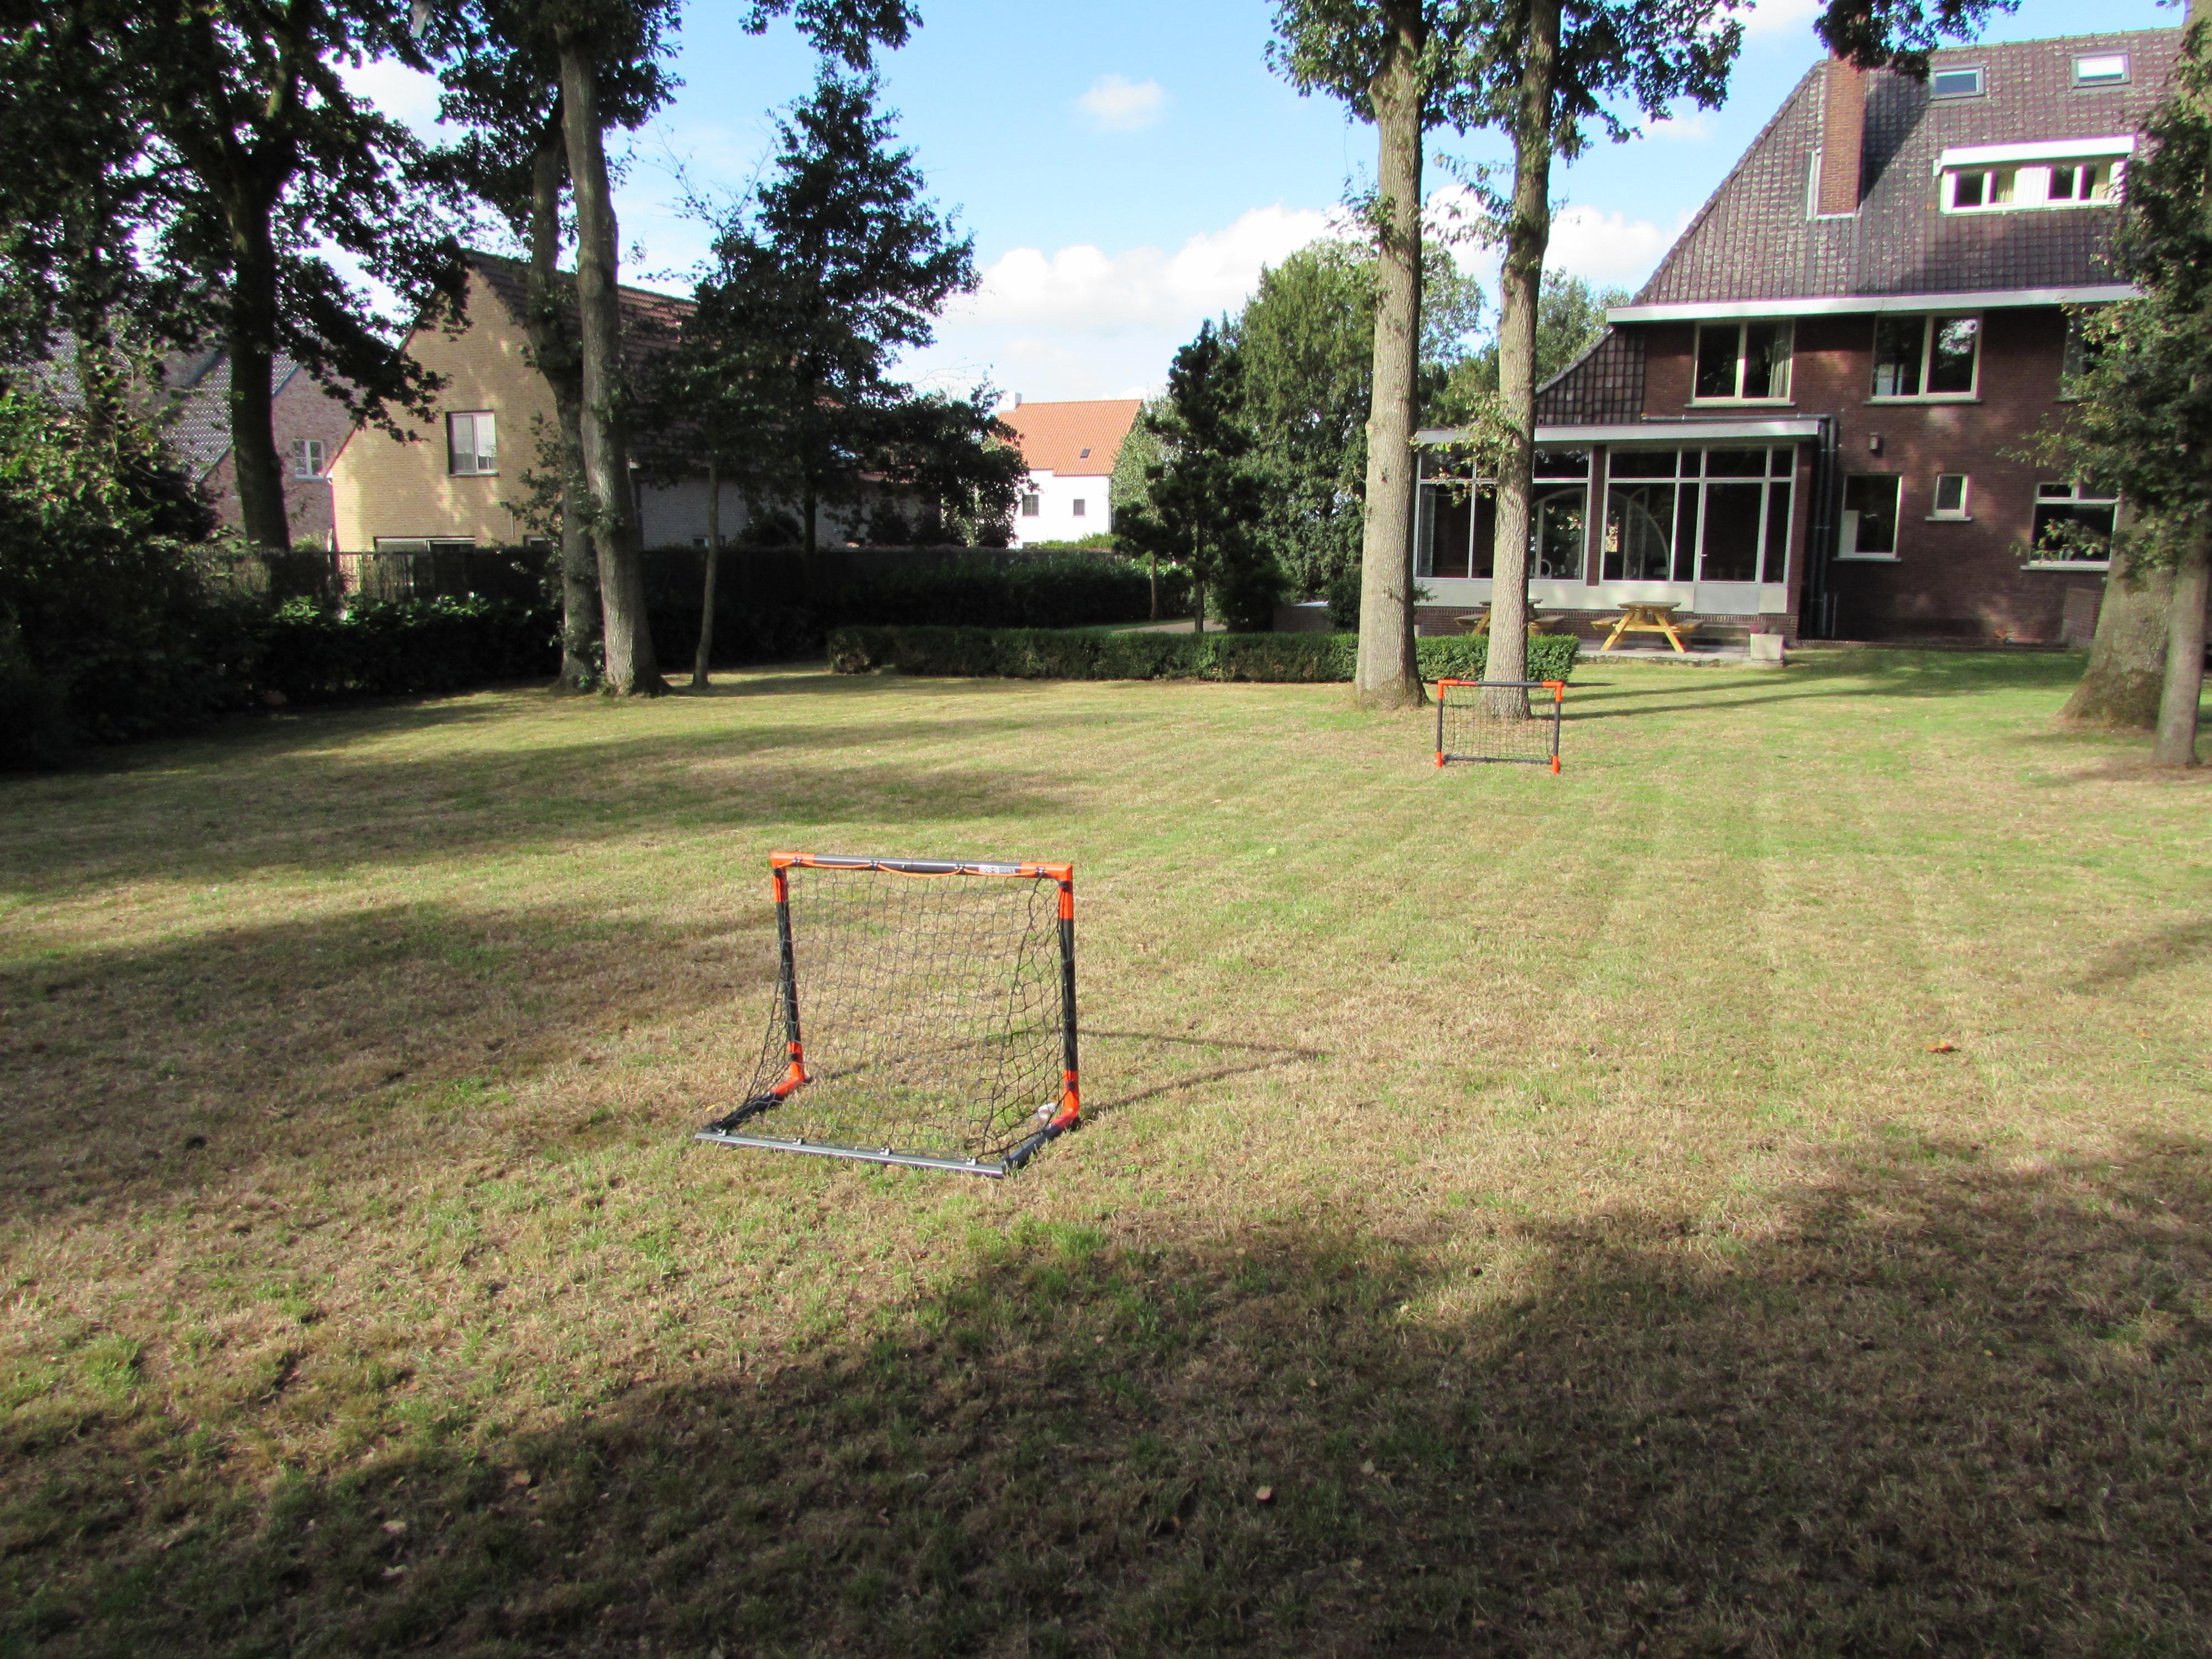 Voetbalveldje in de tuin